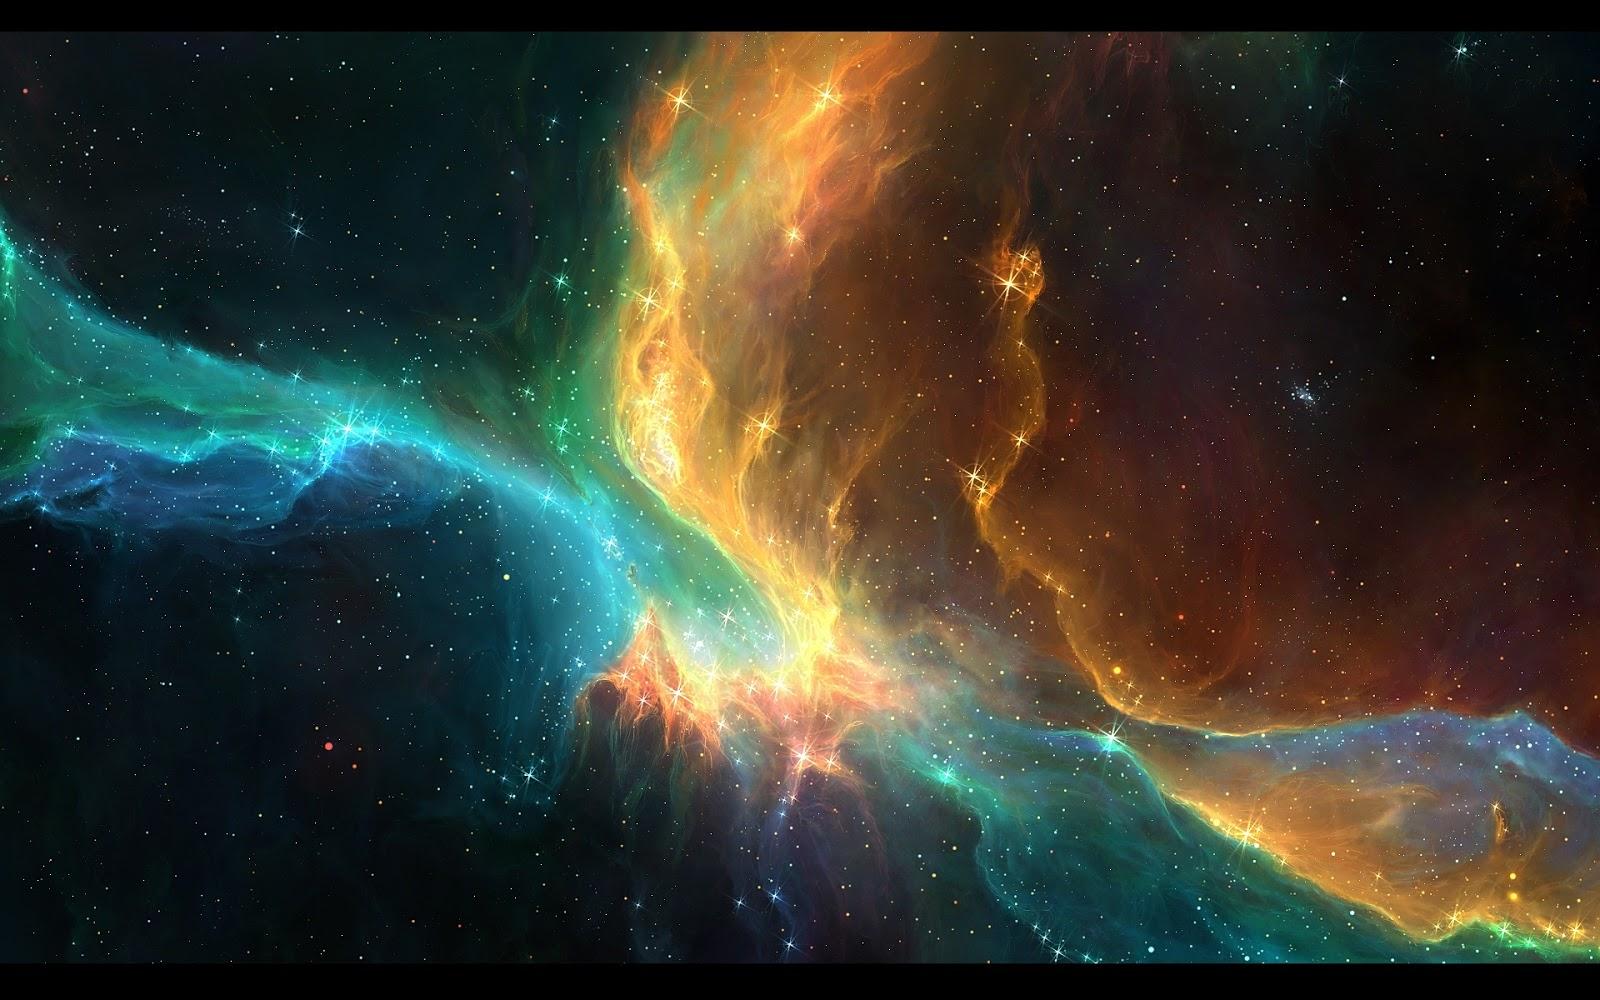 Space Background Wallpaper Windows 10